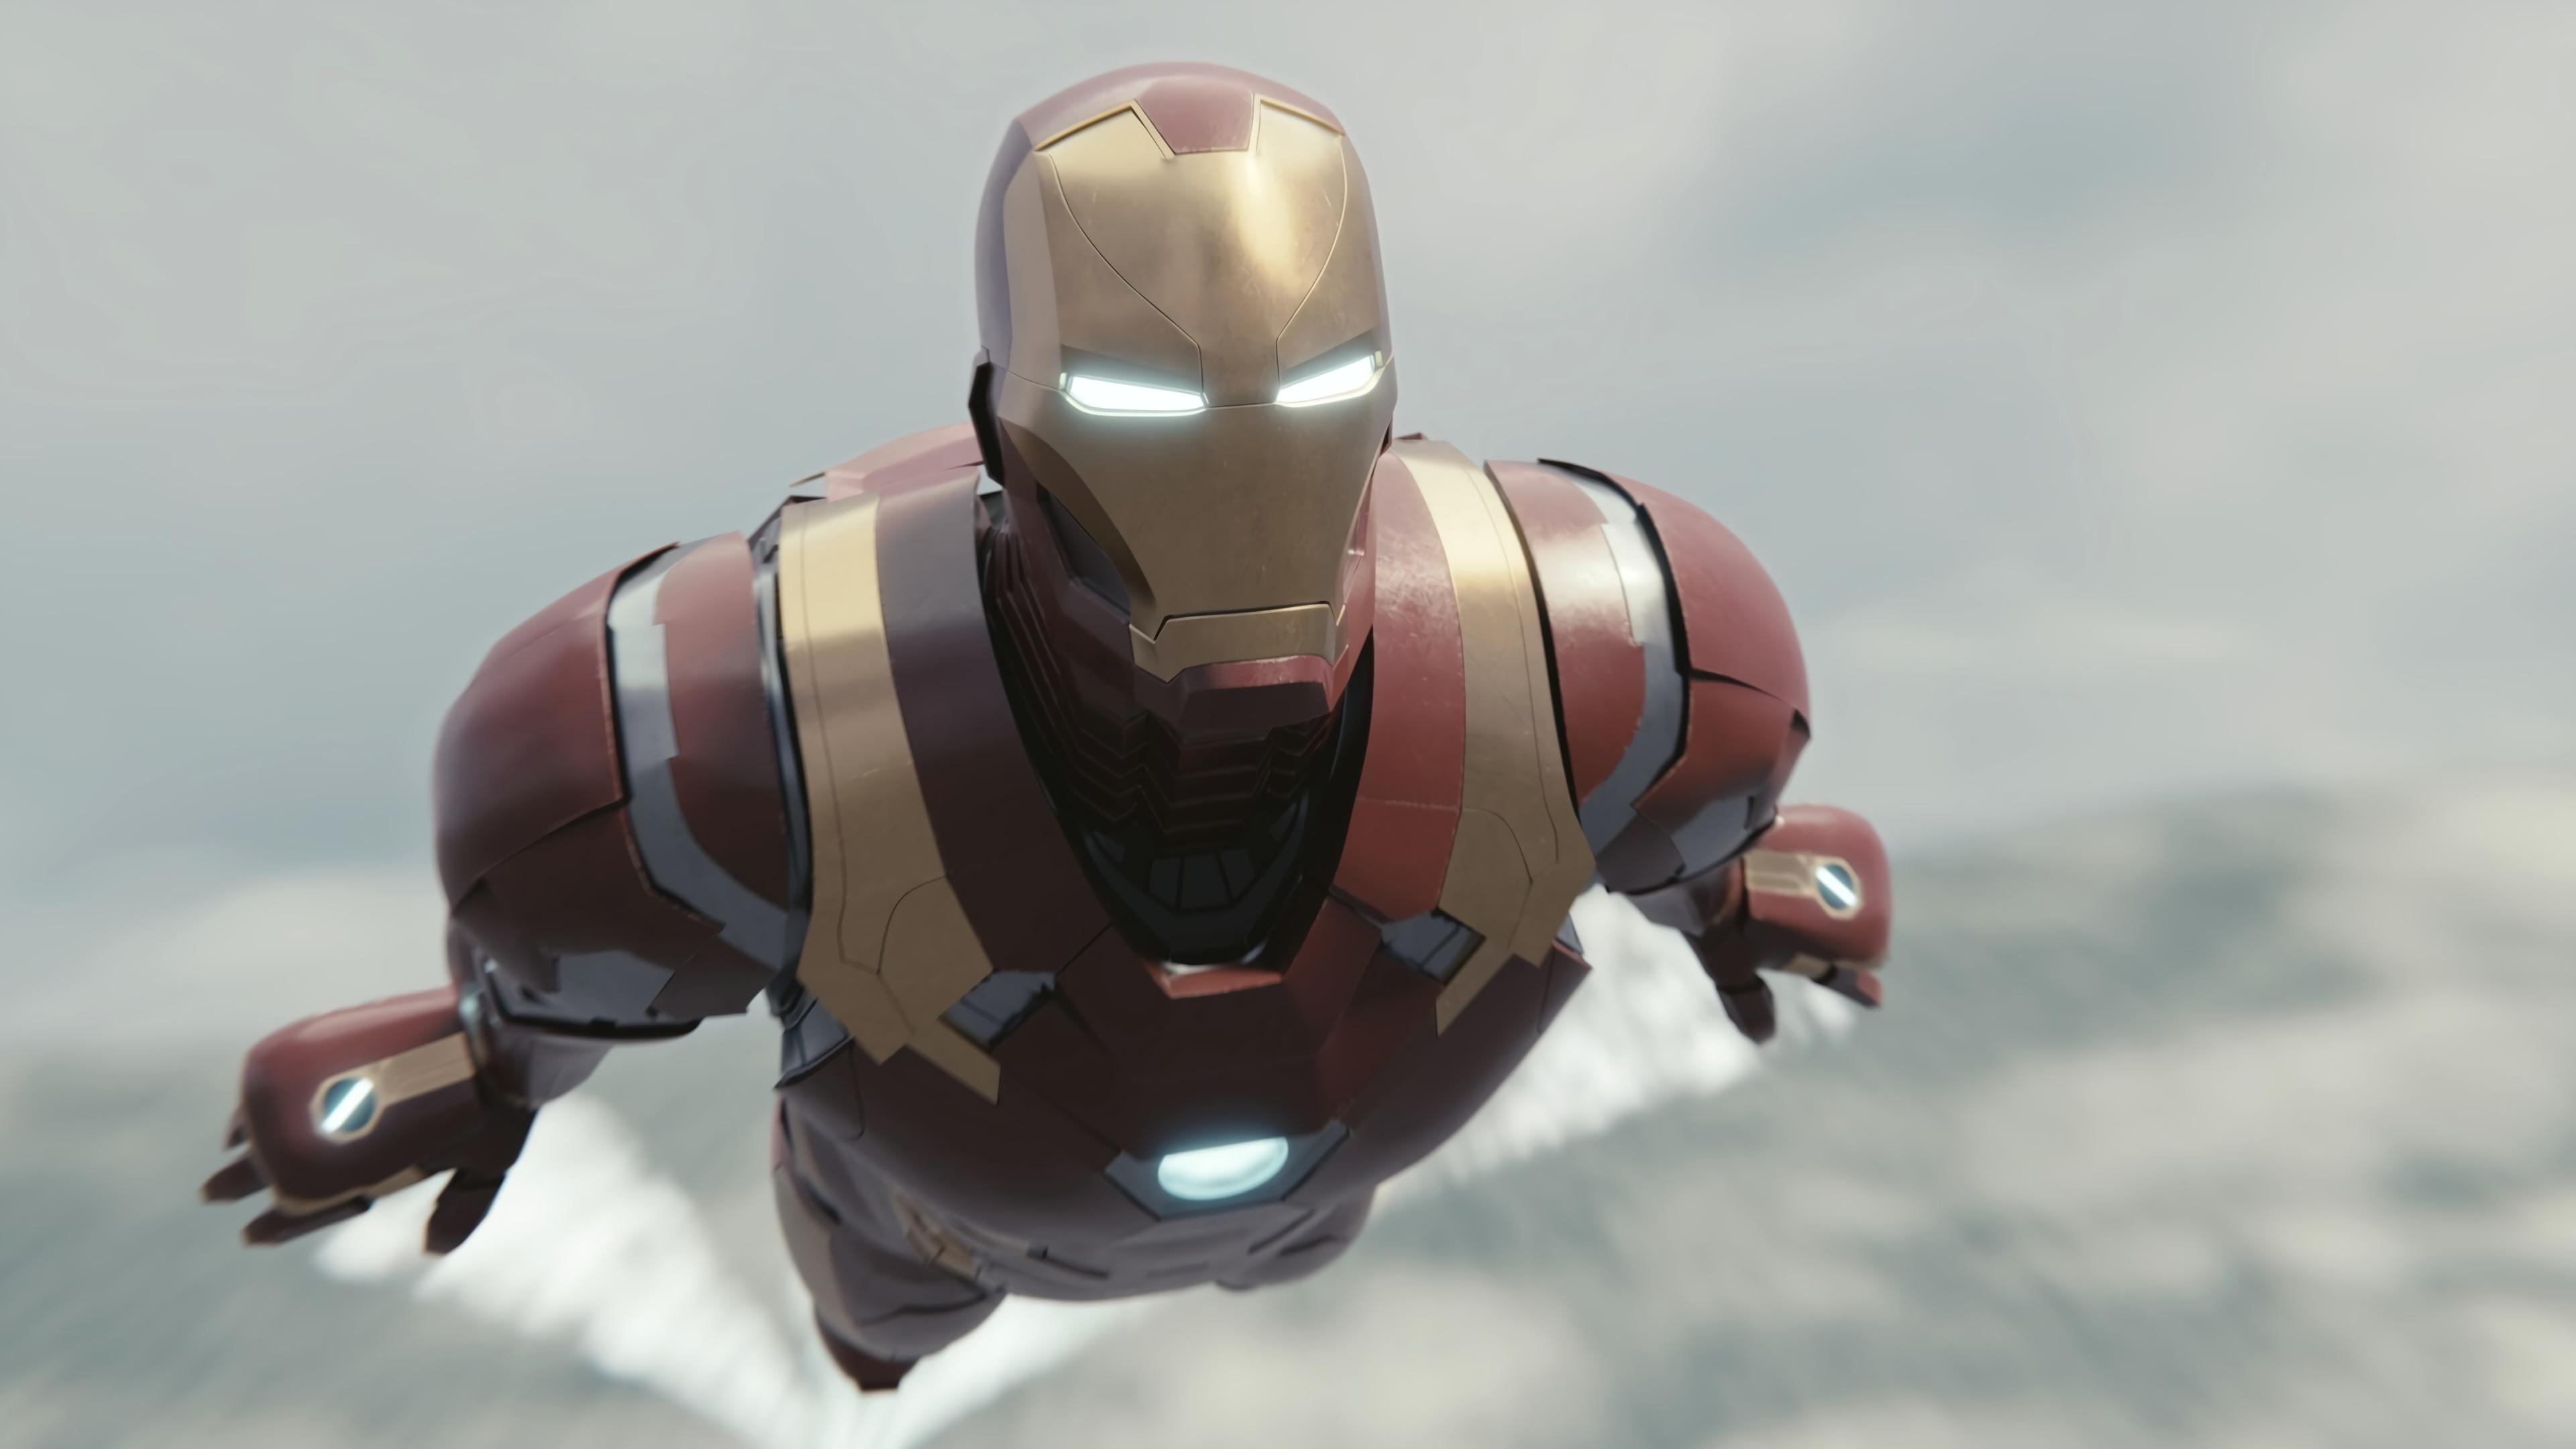 iron man cgi 2019 1568054364 - Iron Man Cgi 2019 - superheroes wallpapers, iron man wallpapers, hd-wallpapers, digital art wallpapers, artwork wallpapers, artstation wallpapers, 4k-wallpapers